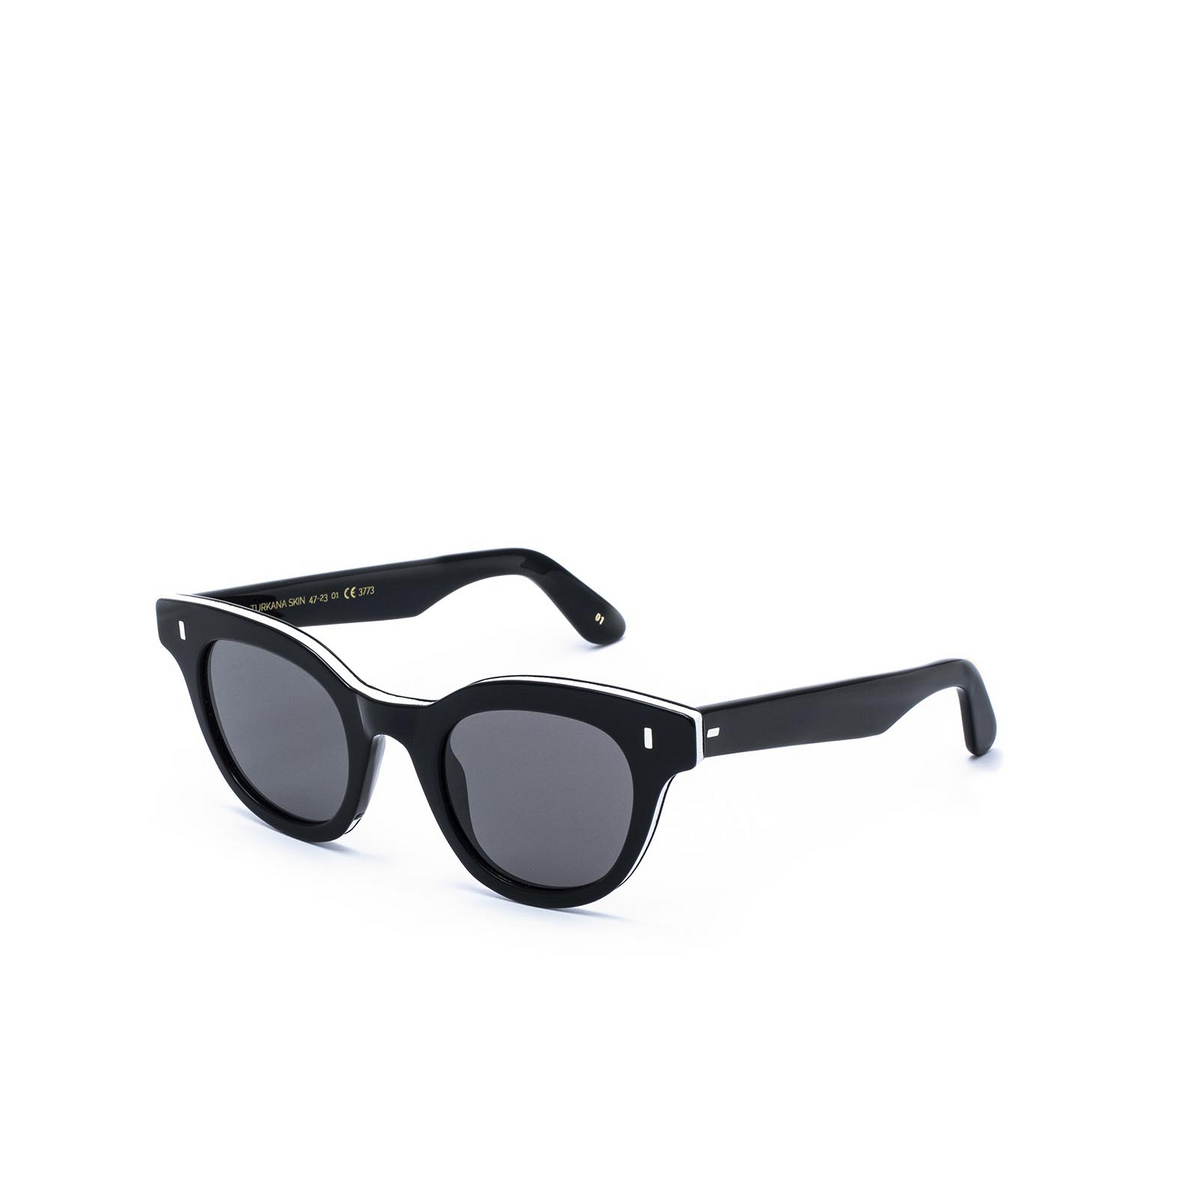 L.G.R® Cat-eye Sunglasses: Turkana Skin color Black 01.